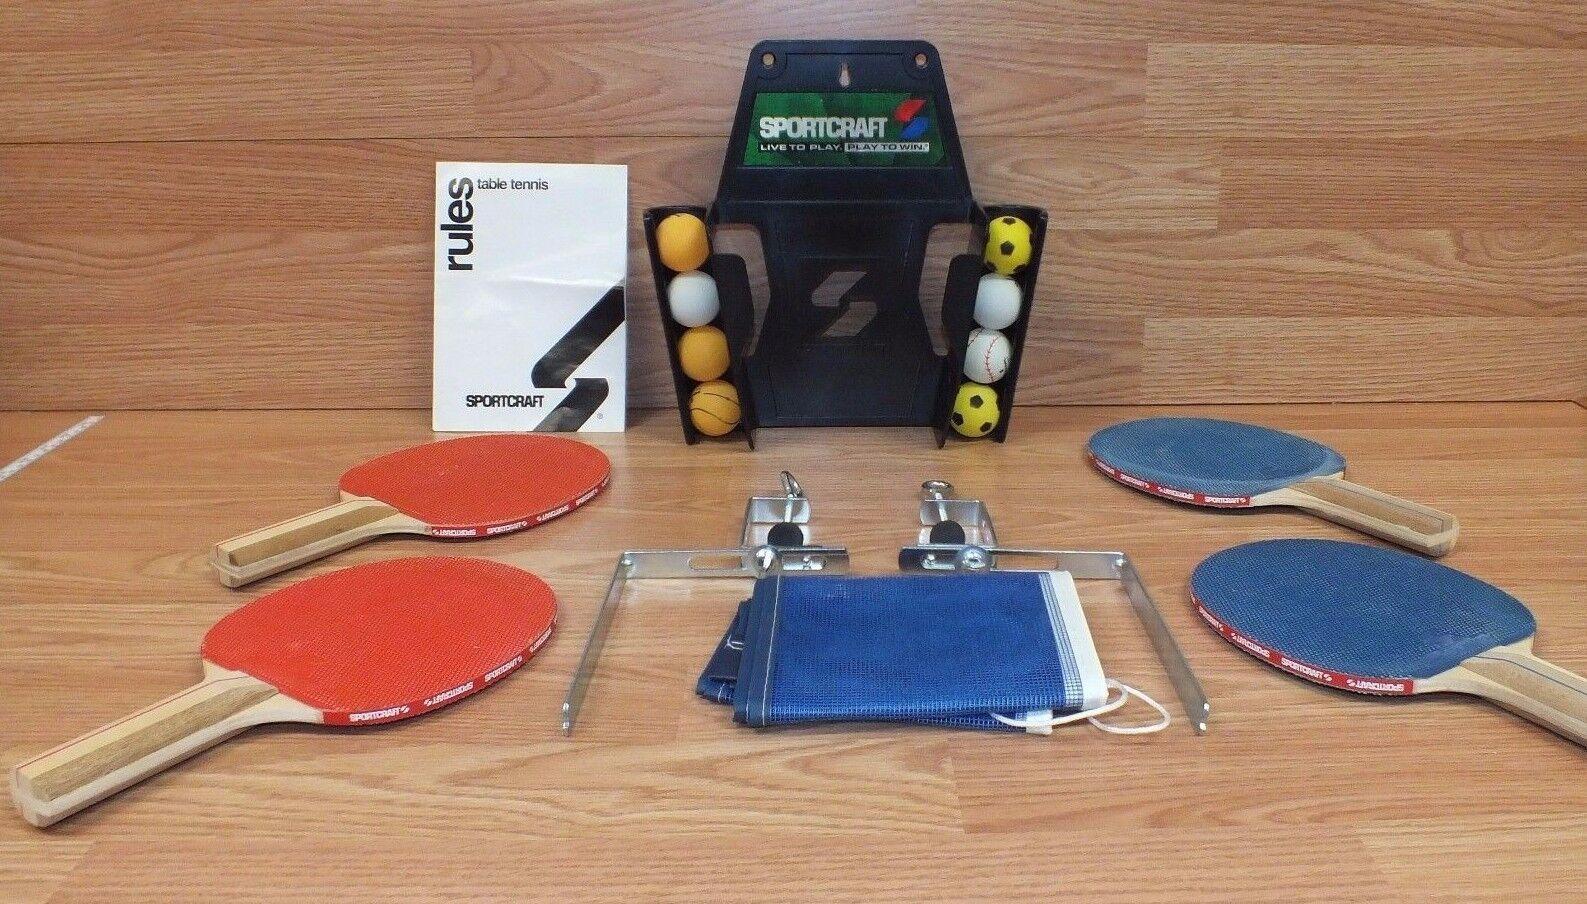 Genuine Sportcraft (19008) Ping Pong, Table Tennis, 4 Paddles & 8 Balls READ